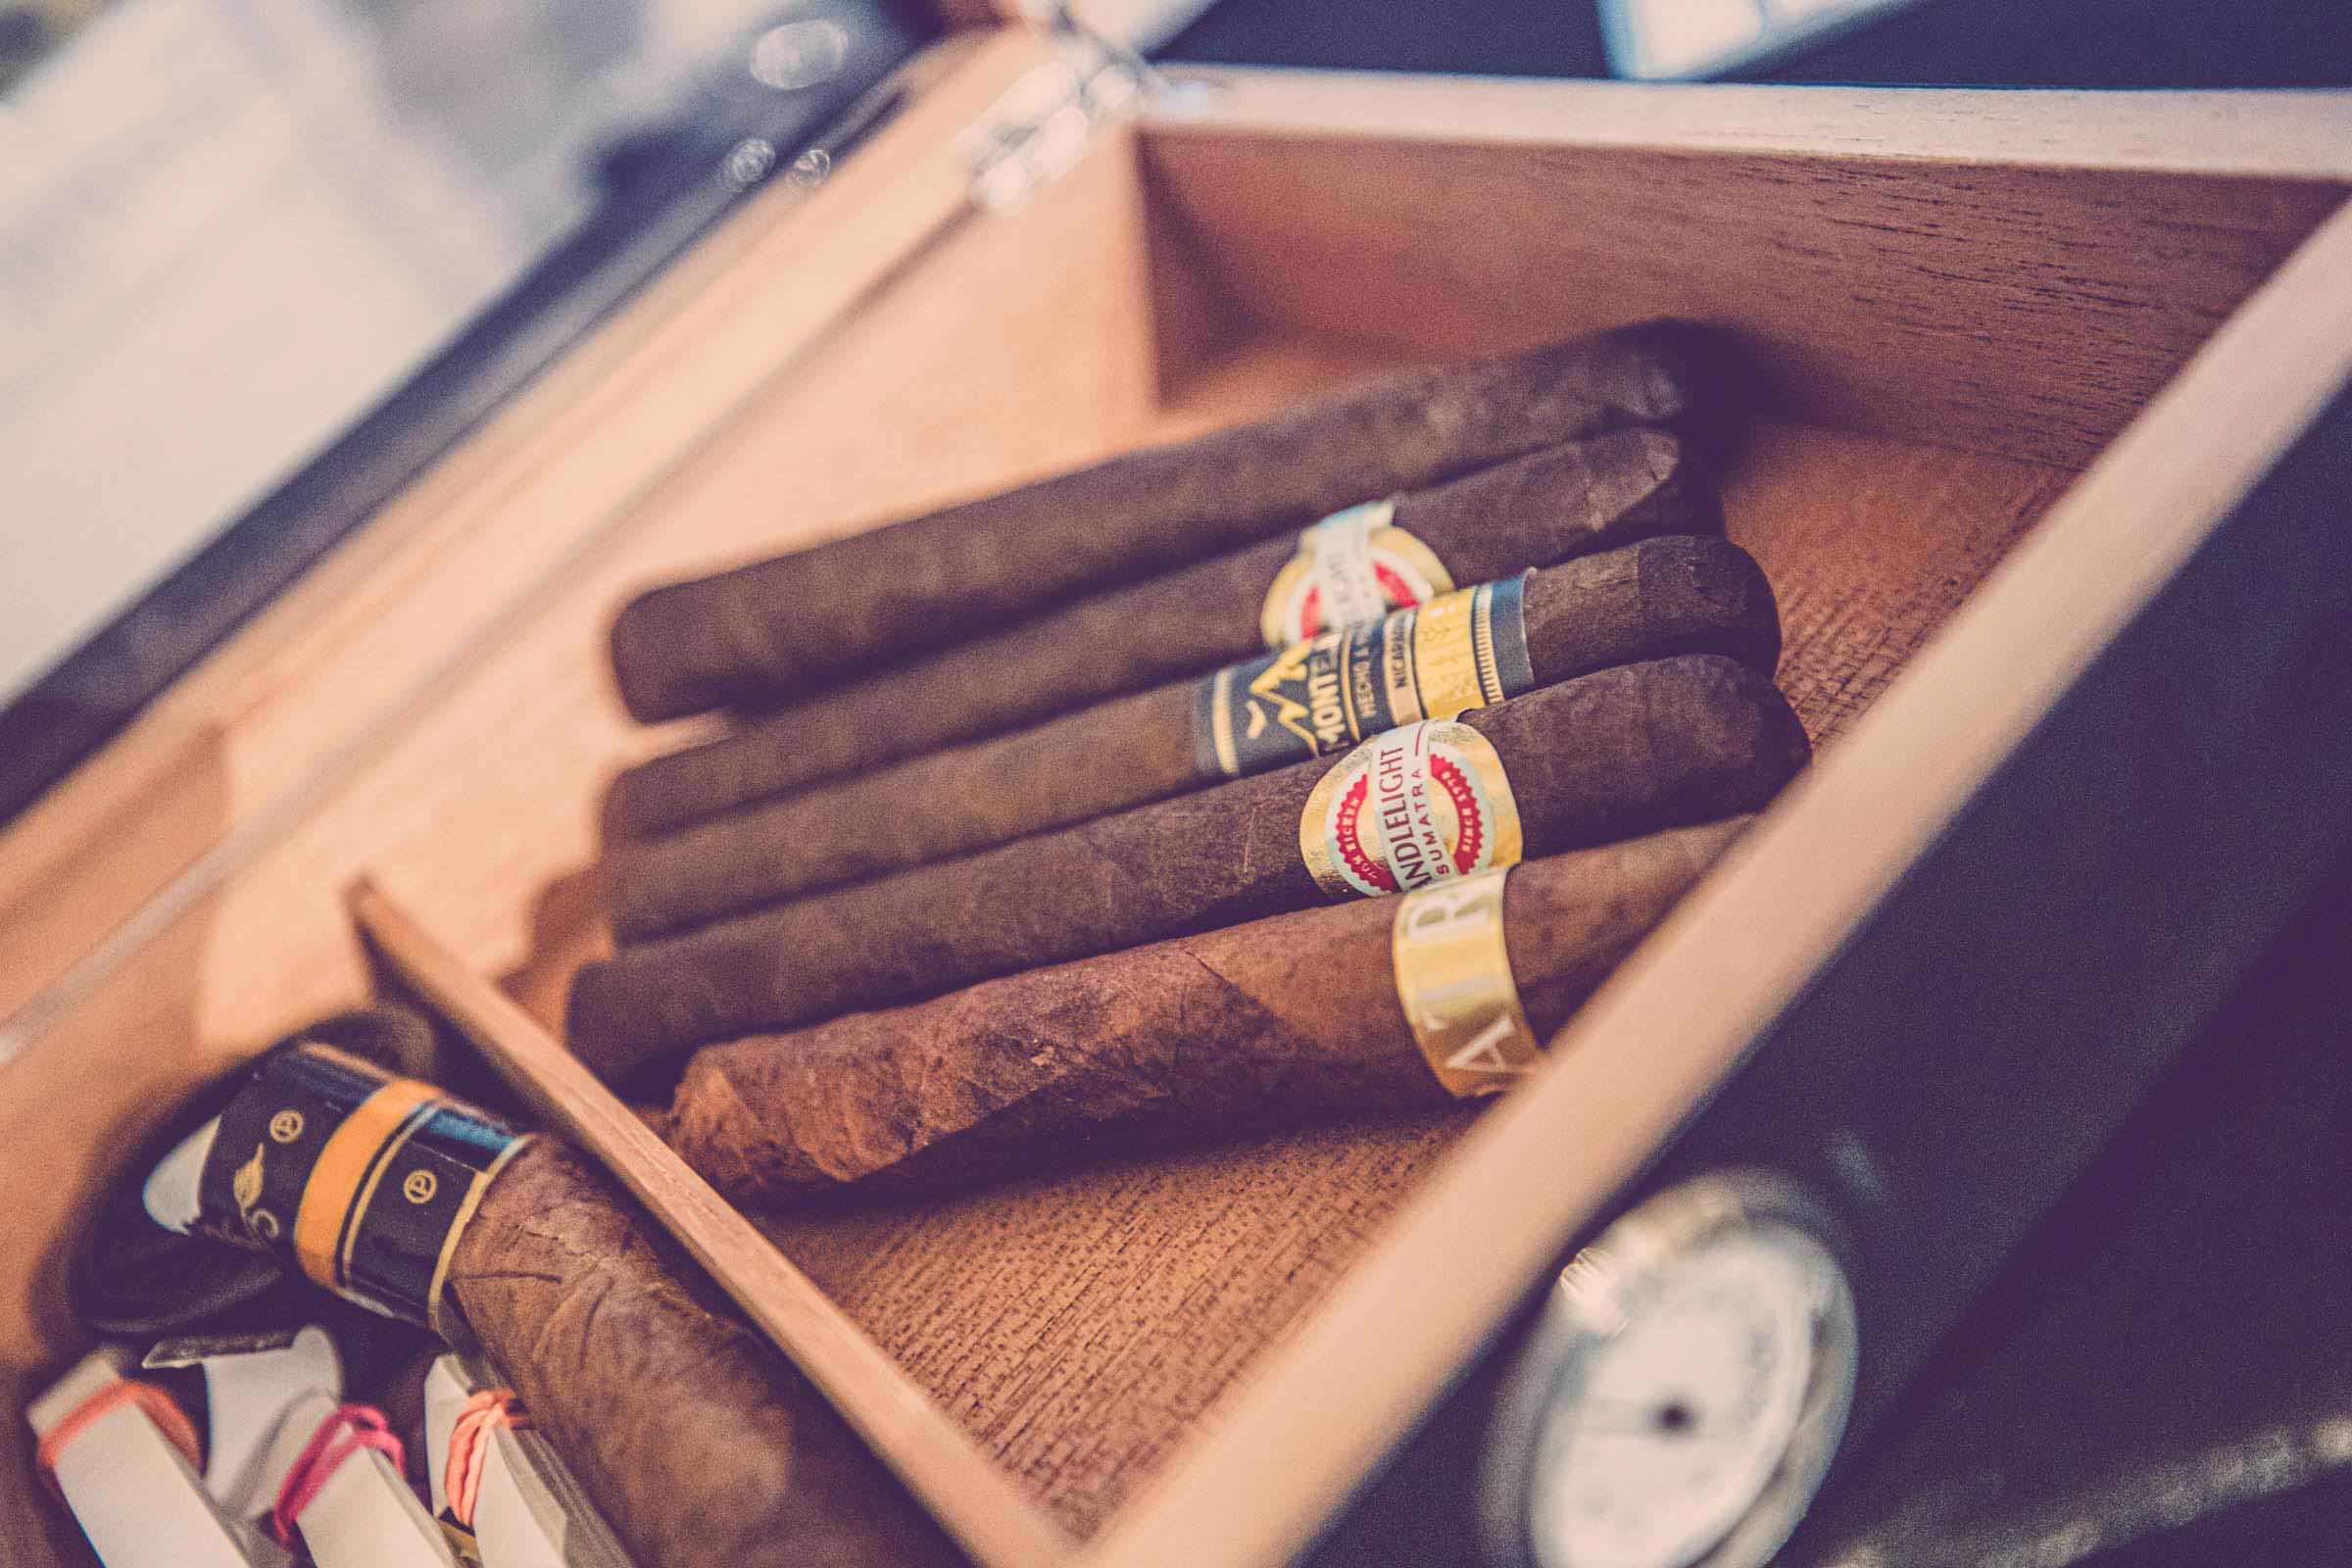 Zigarrendreher | Hamburg | Zigarrenroller | Zigarrenrollerin | Trocadero | Kaufen | Buchen | Mieten | Handgemacht | Zigarren | Fabrik | HerstellungChurchill | Robusto | Corona | Robusto | Banderole | Bauchbinde | Drehen | Tabak